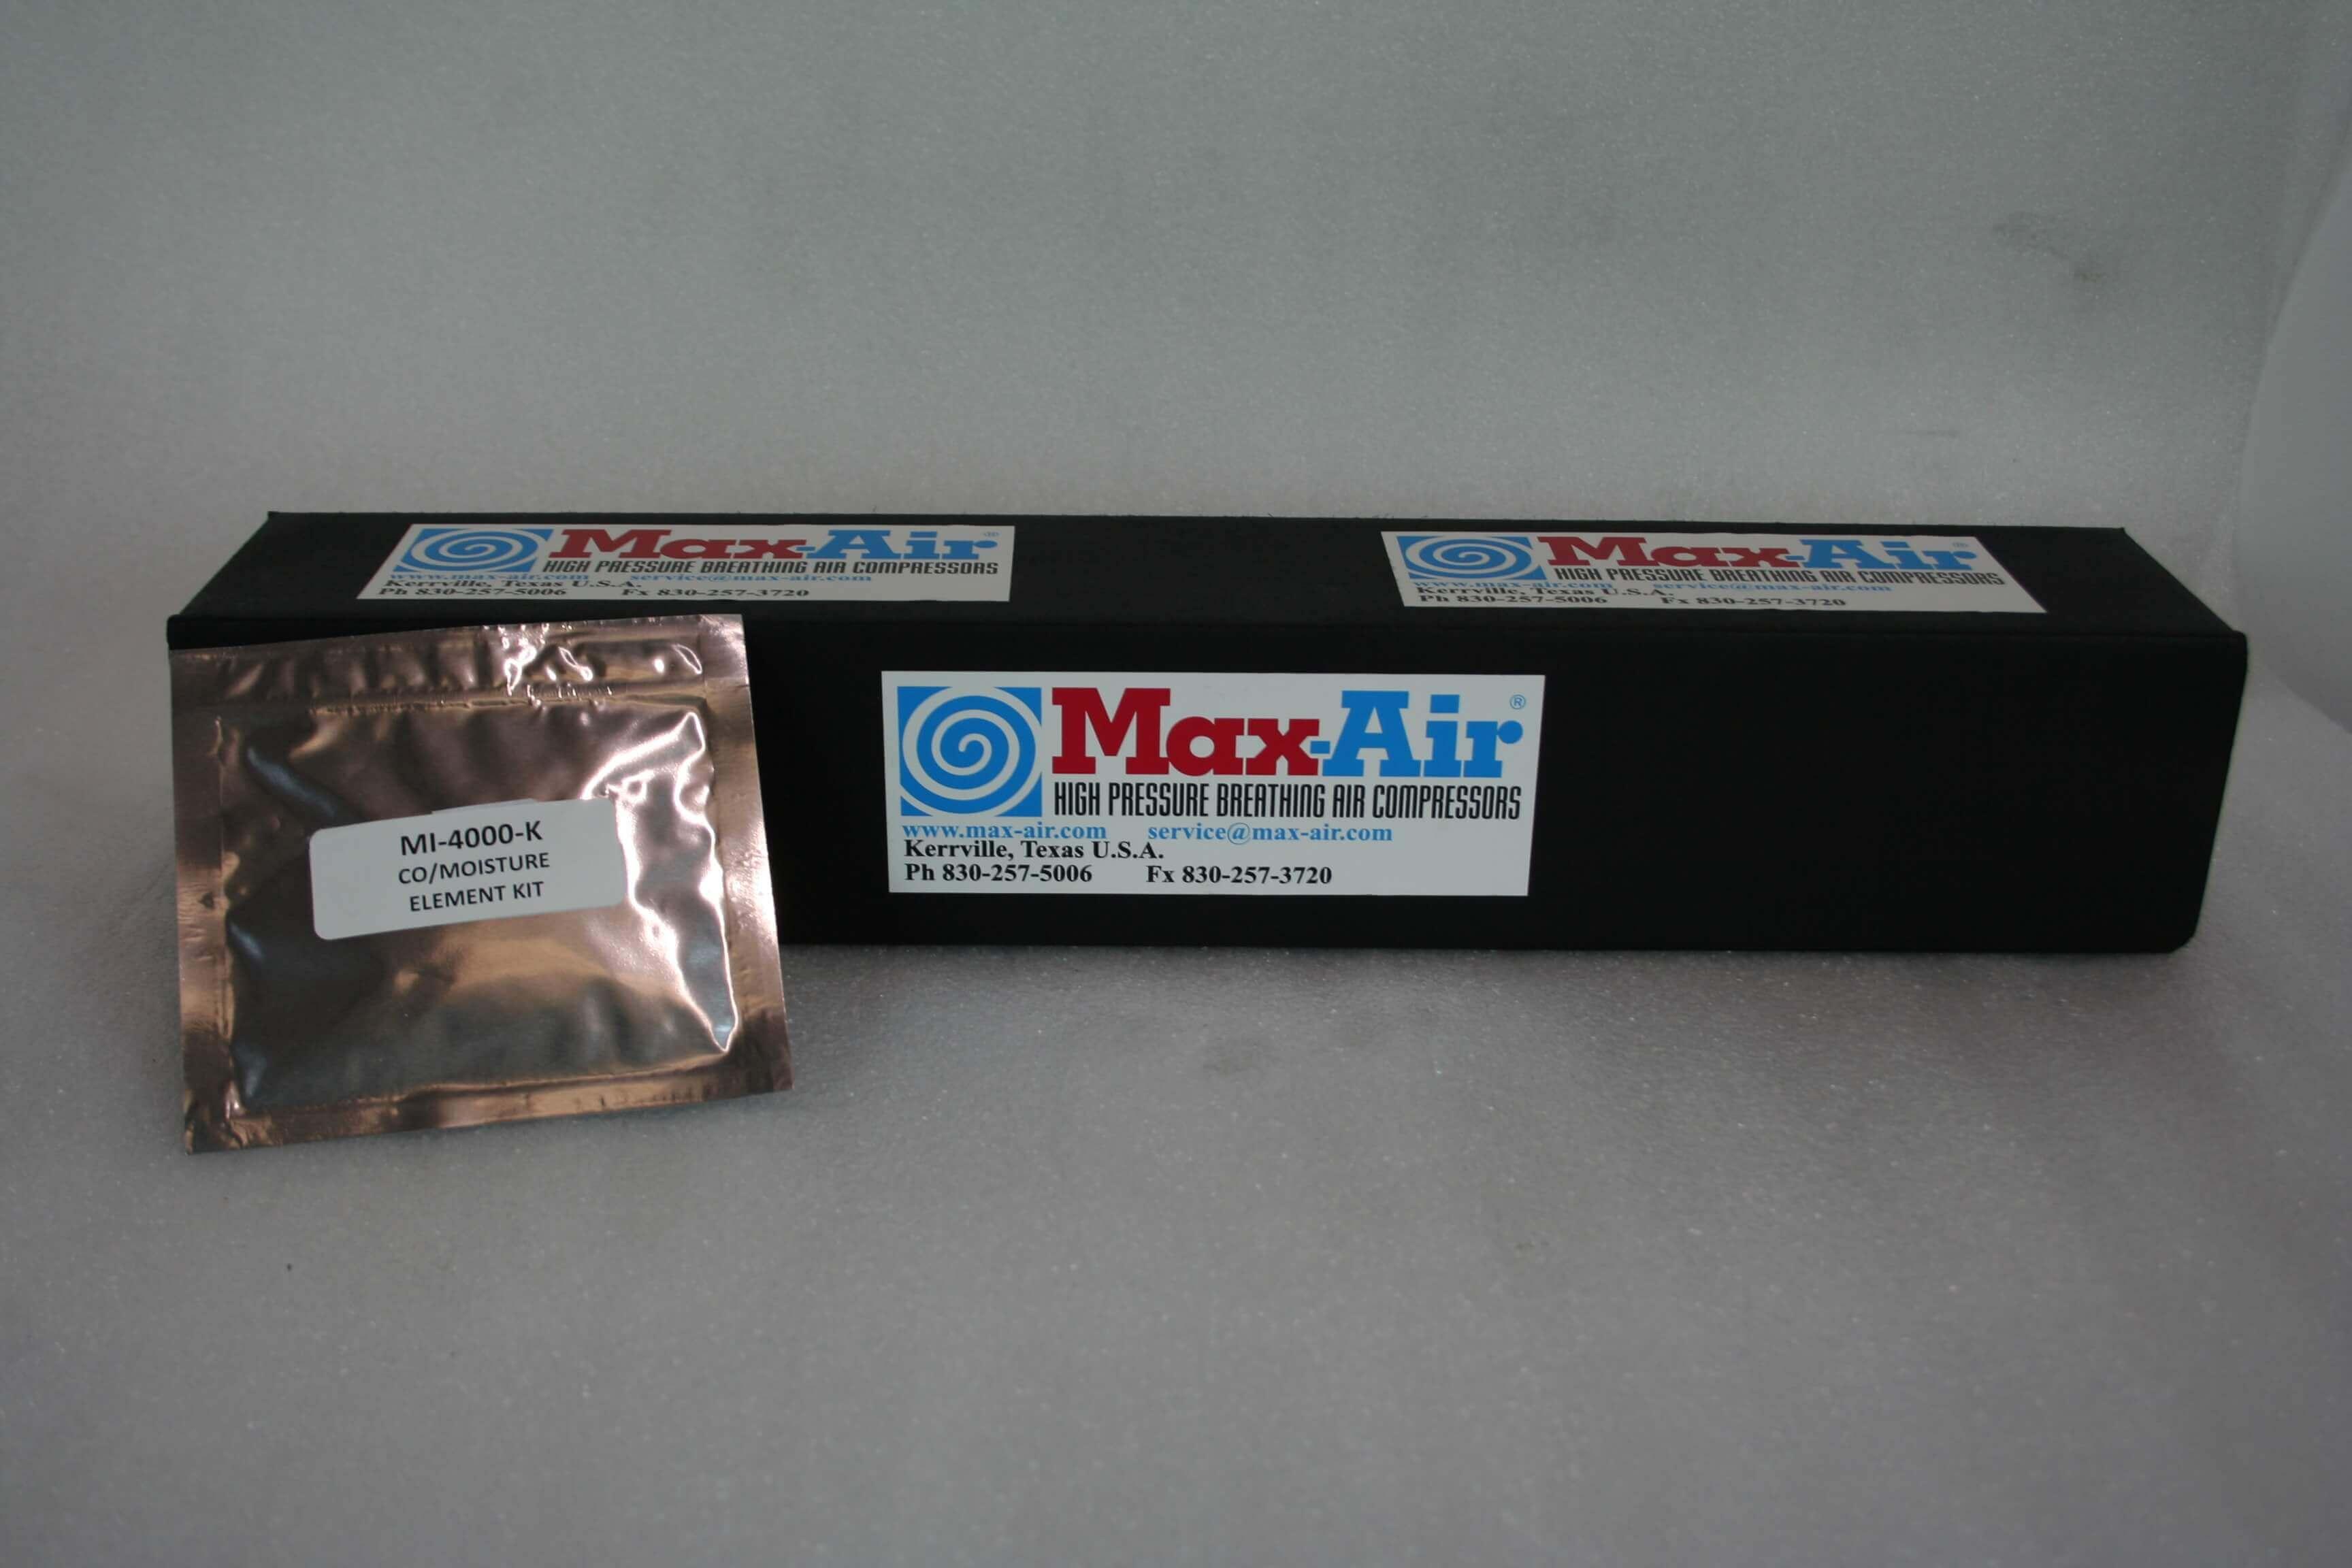 Max-Air MI-4000K CO/Moisture Element Kit